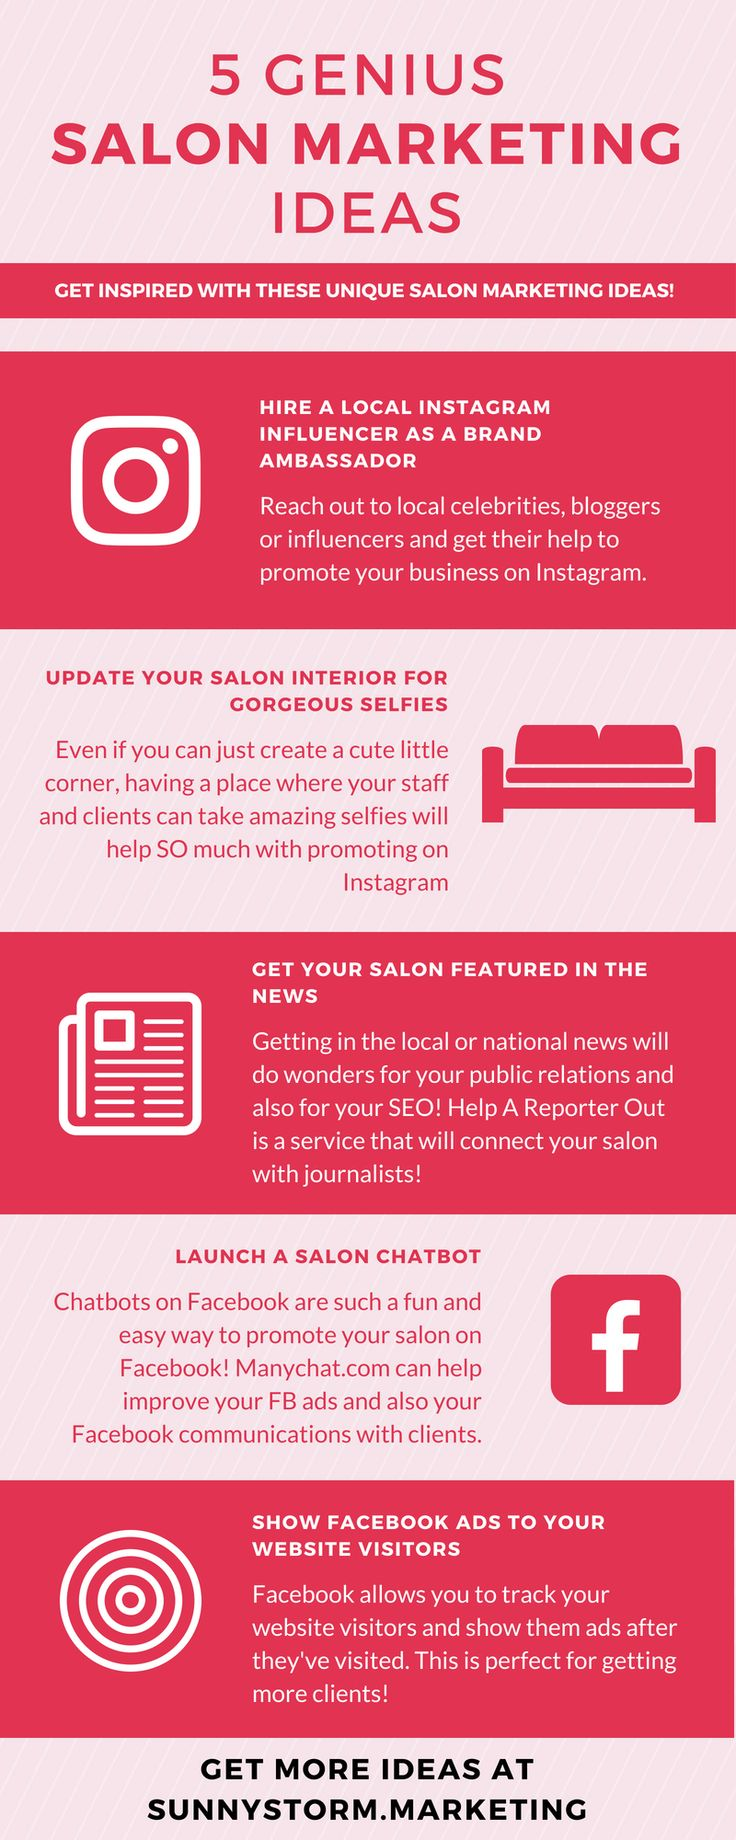 5 Genius Salon Marketing Ideas: Get ideas for promoting ...